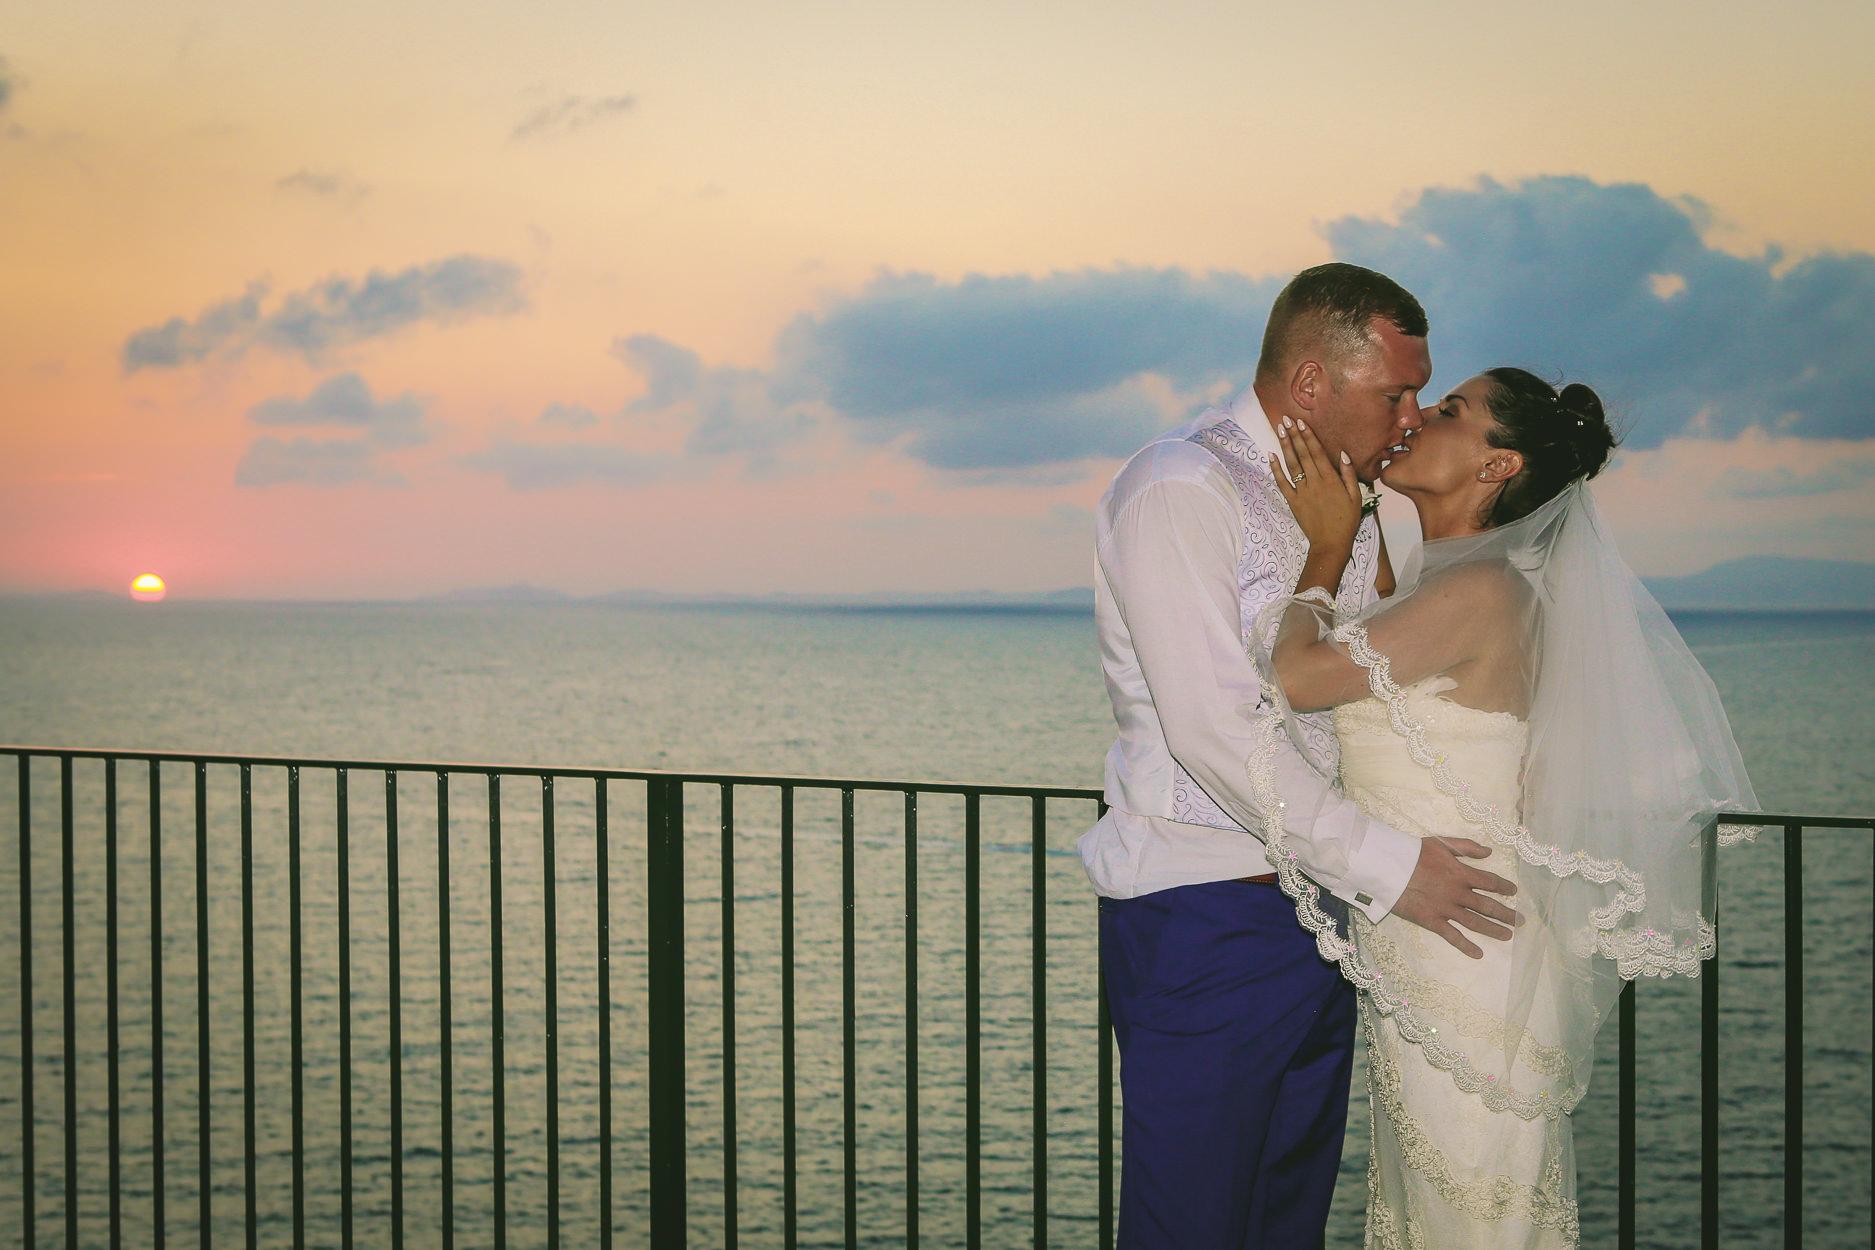 Amalfi-Coast-wedding-venue-Wedding-Photography-Villa Antiche Mura-Sorrento-Italy-29